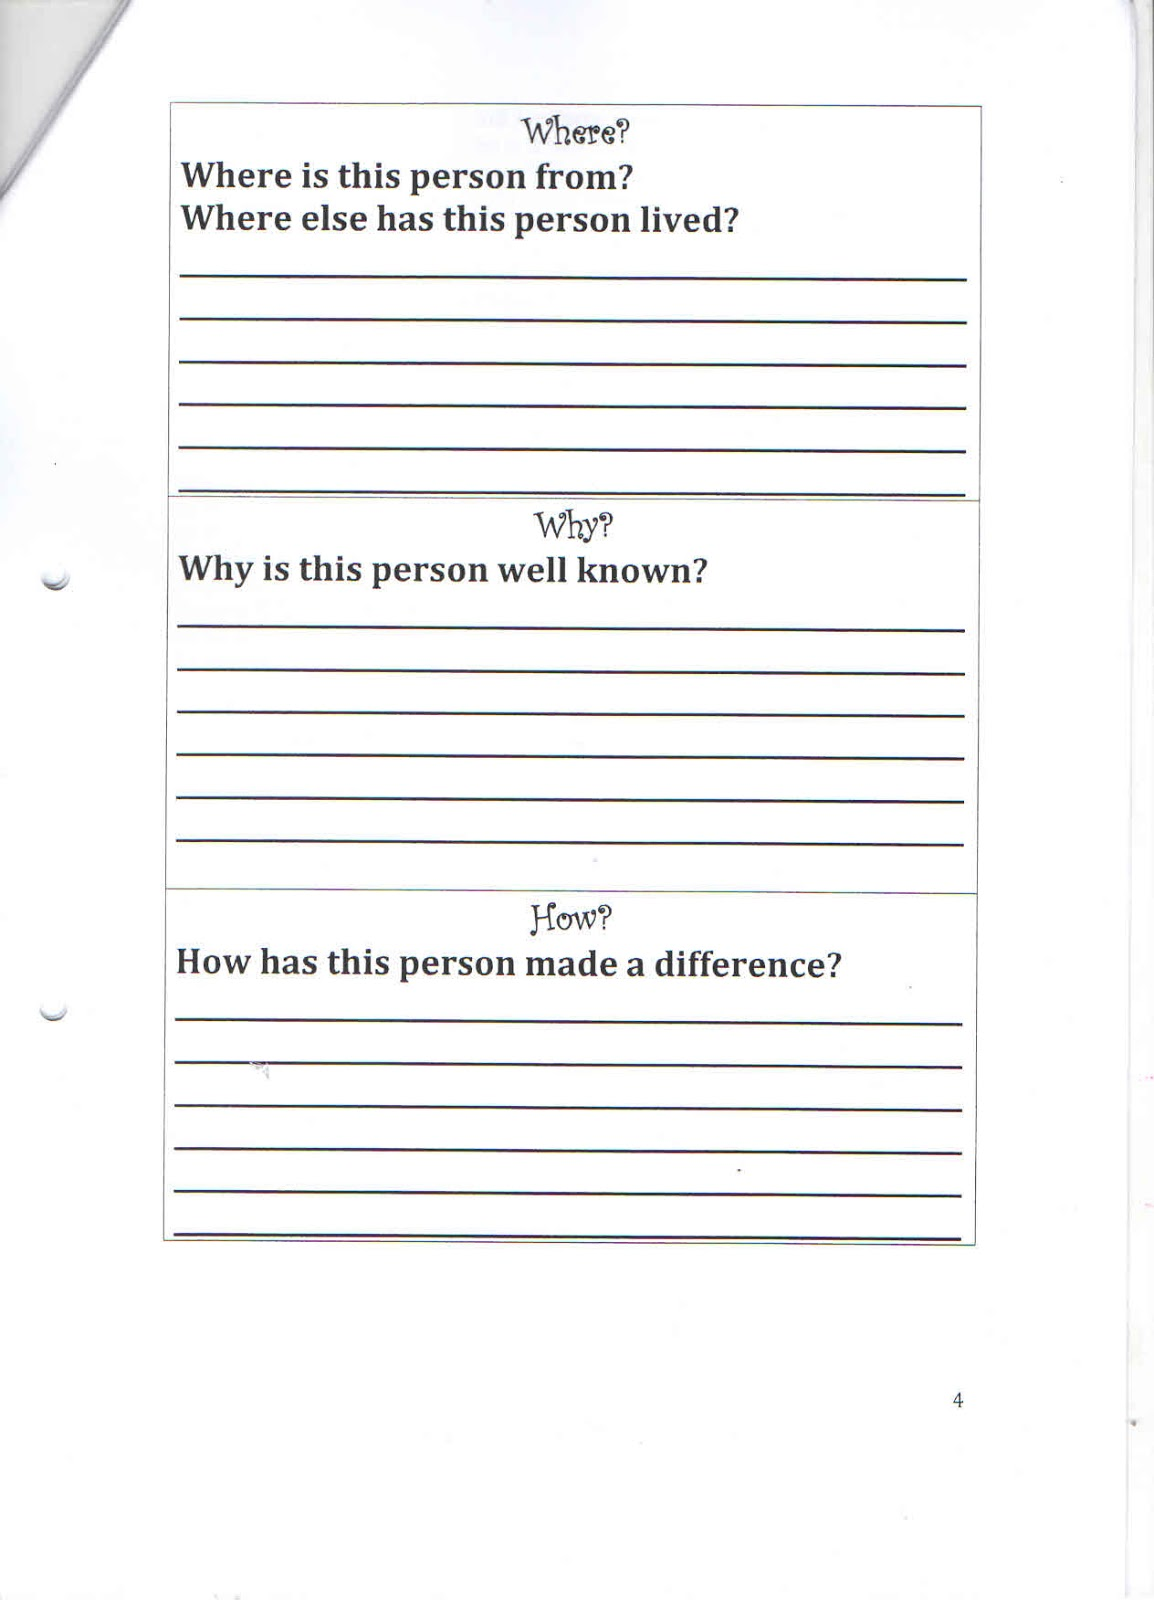 Grade 6 Interview Questions